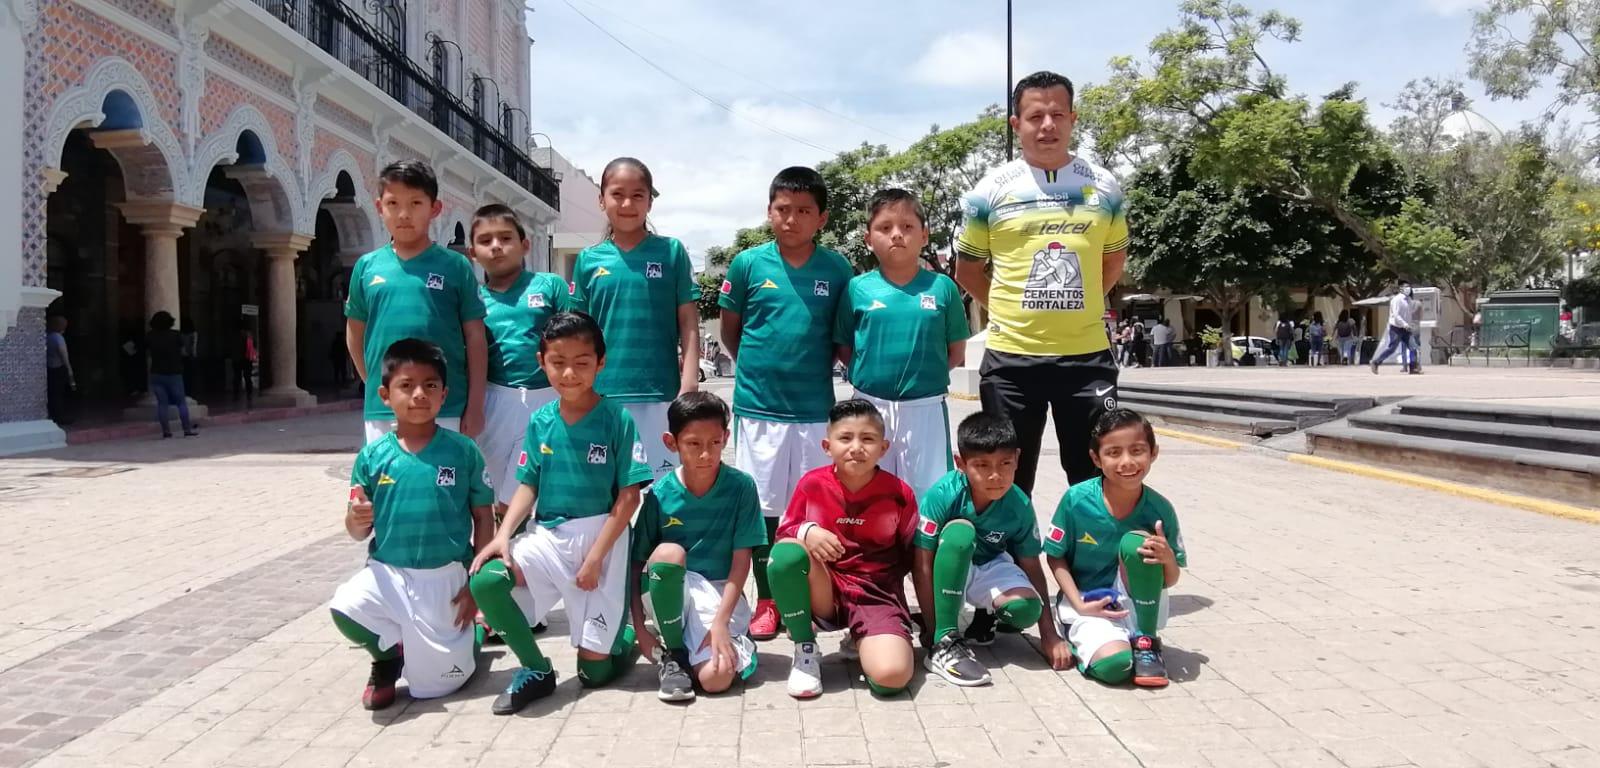 Equipo de fútbol infantil de Tehuacán viajará a Colombia representando a México